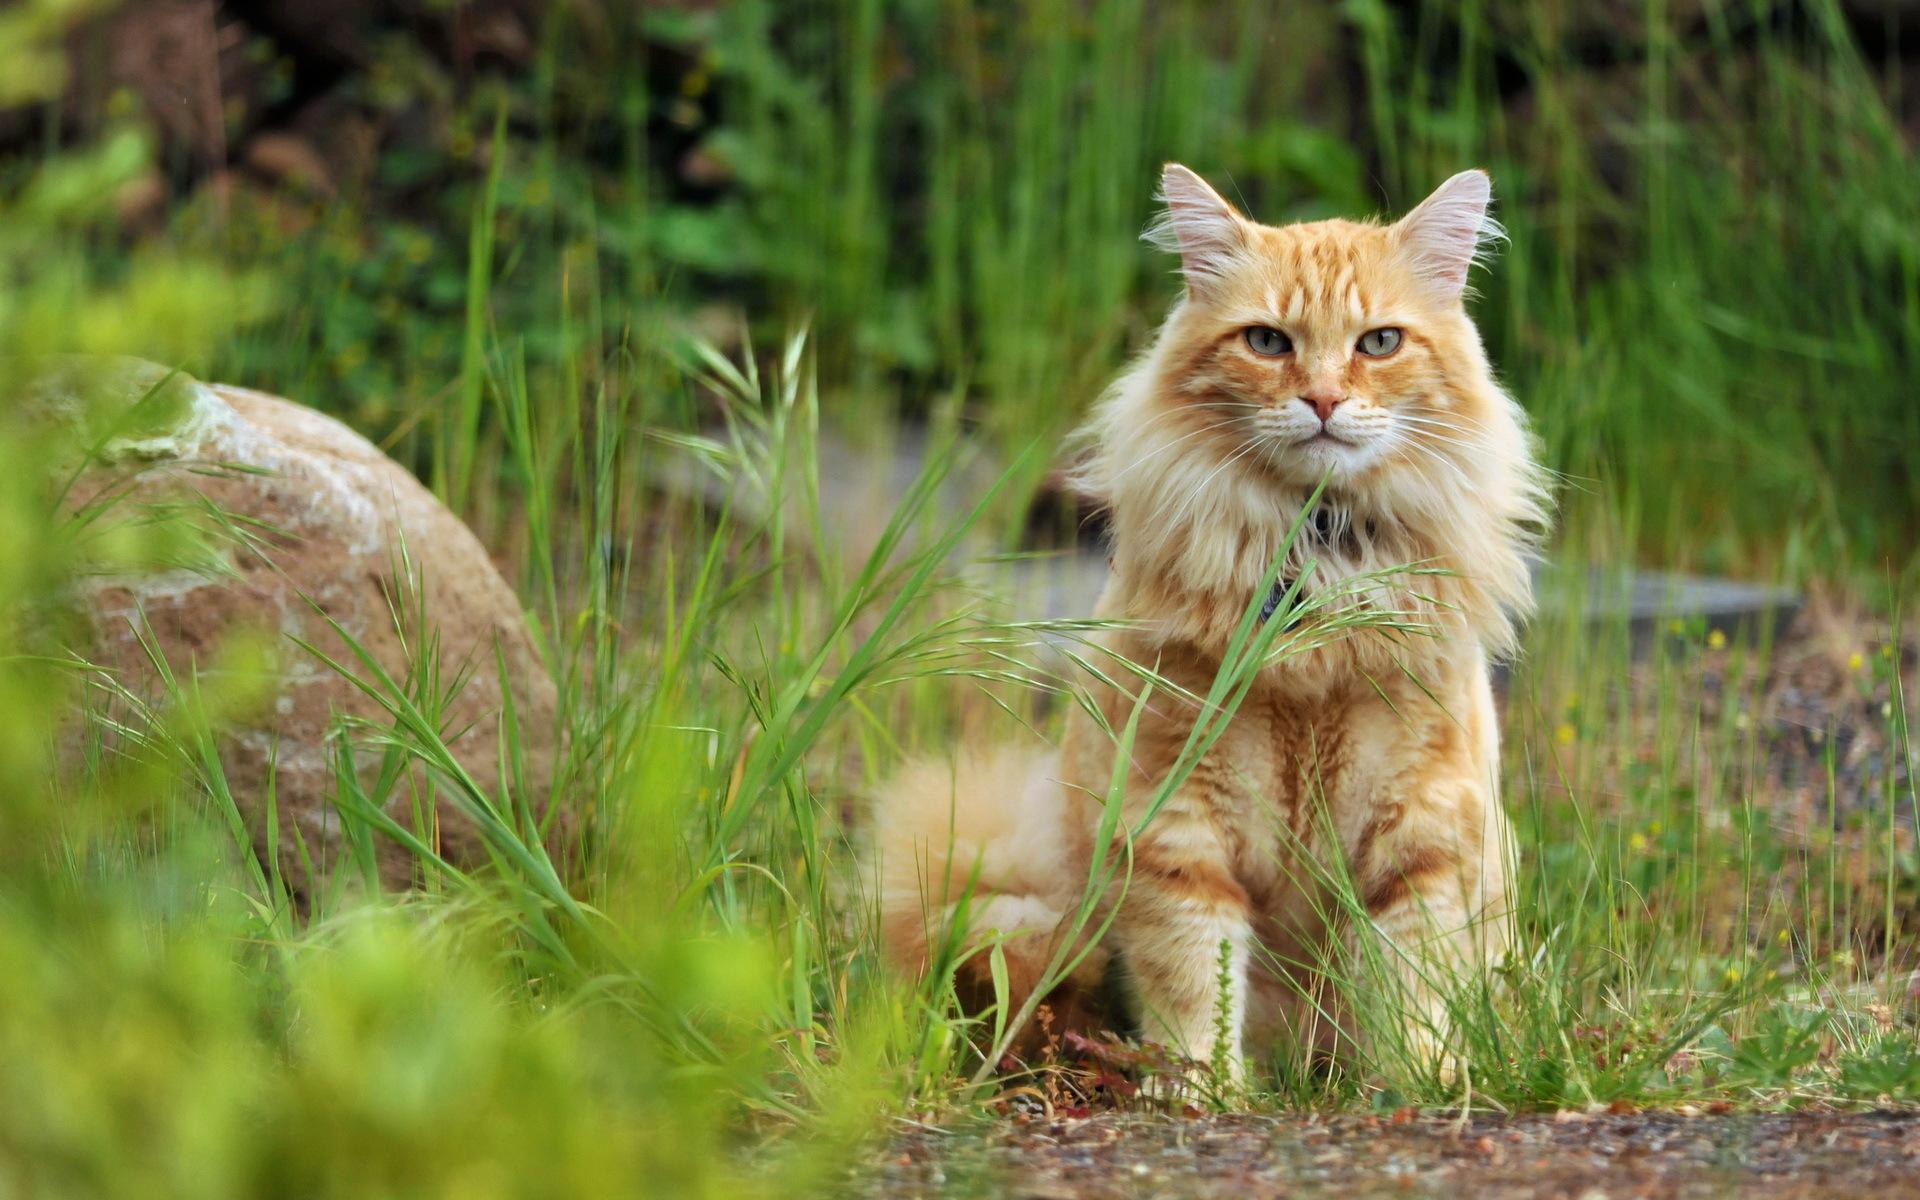 Обои картинки фото кошка взгляд